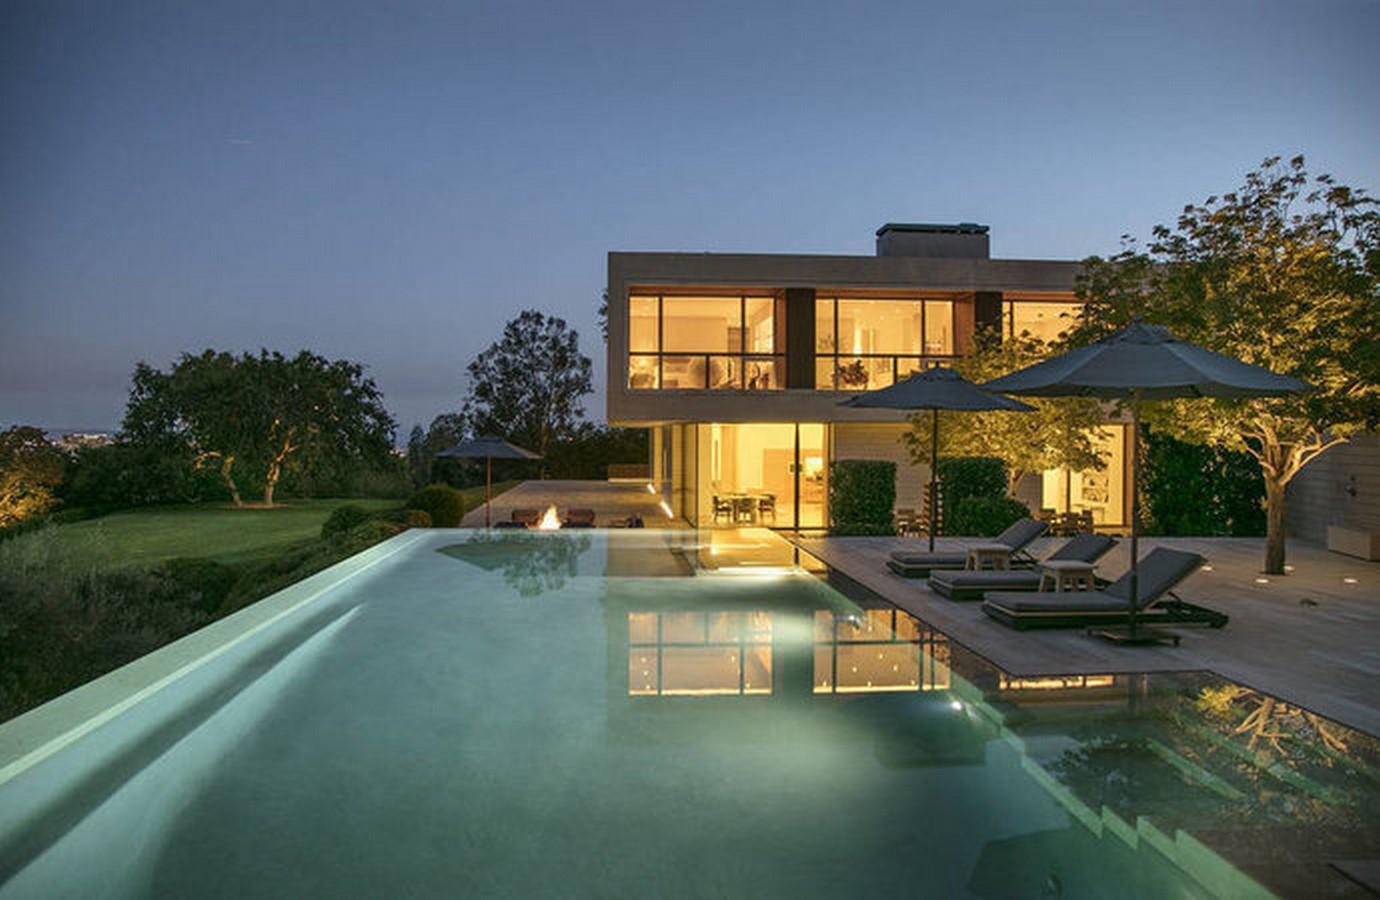 Los Angeles home, by John Pawson - Sheet2